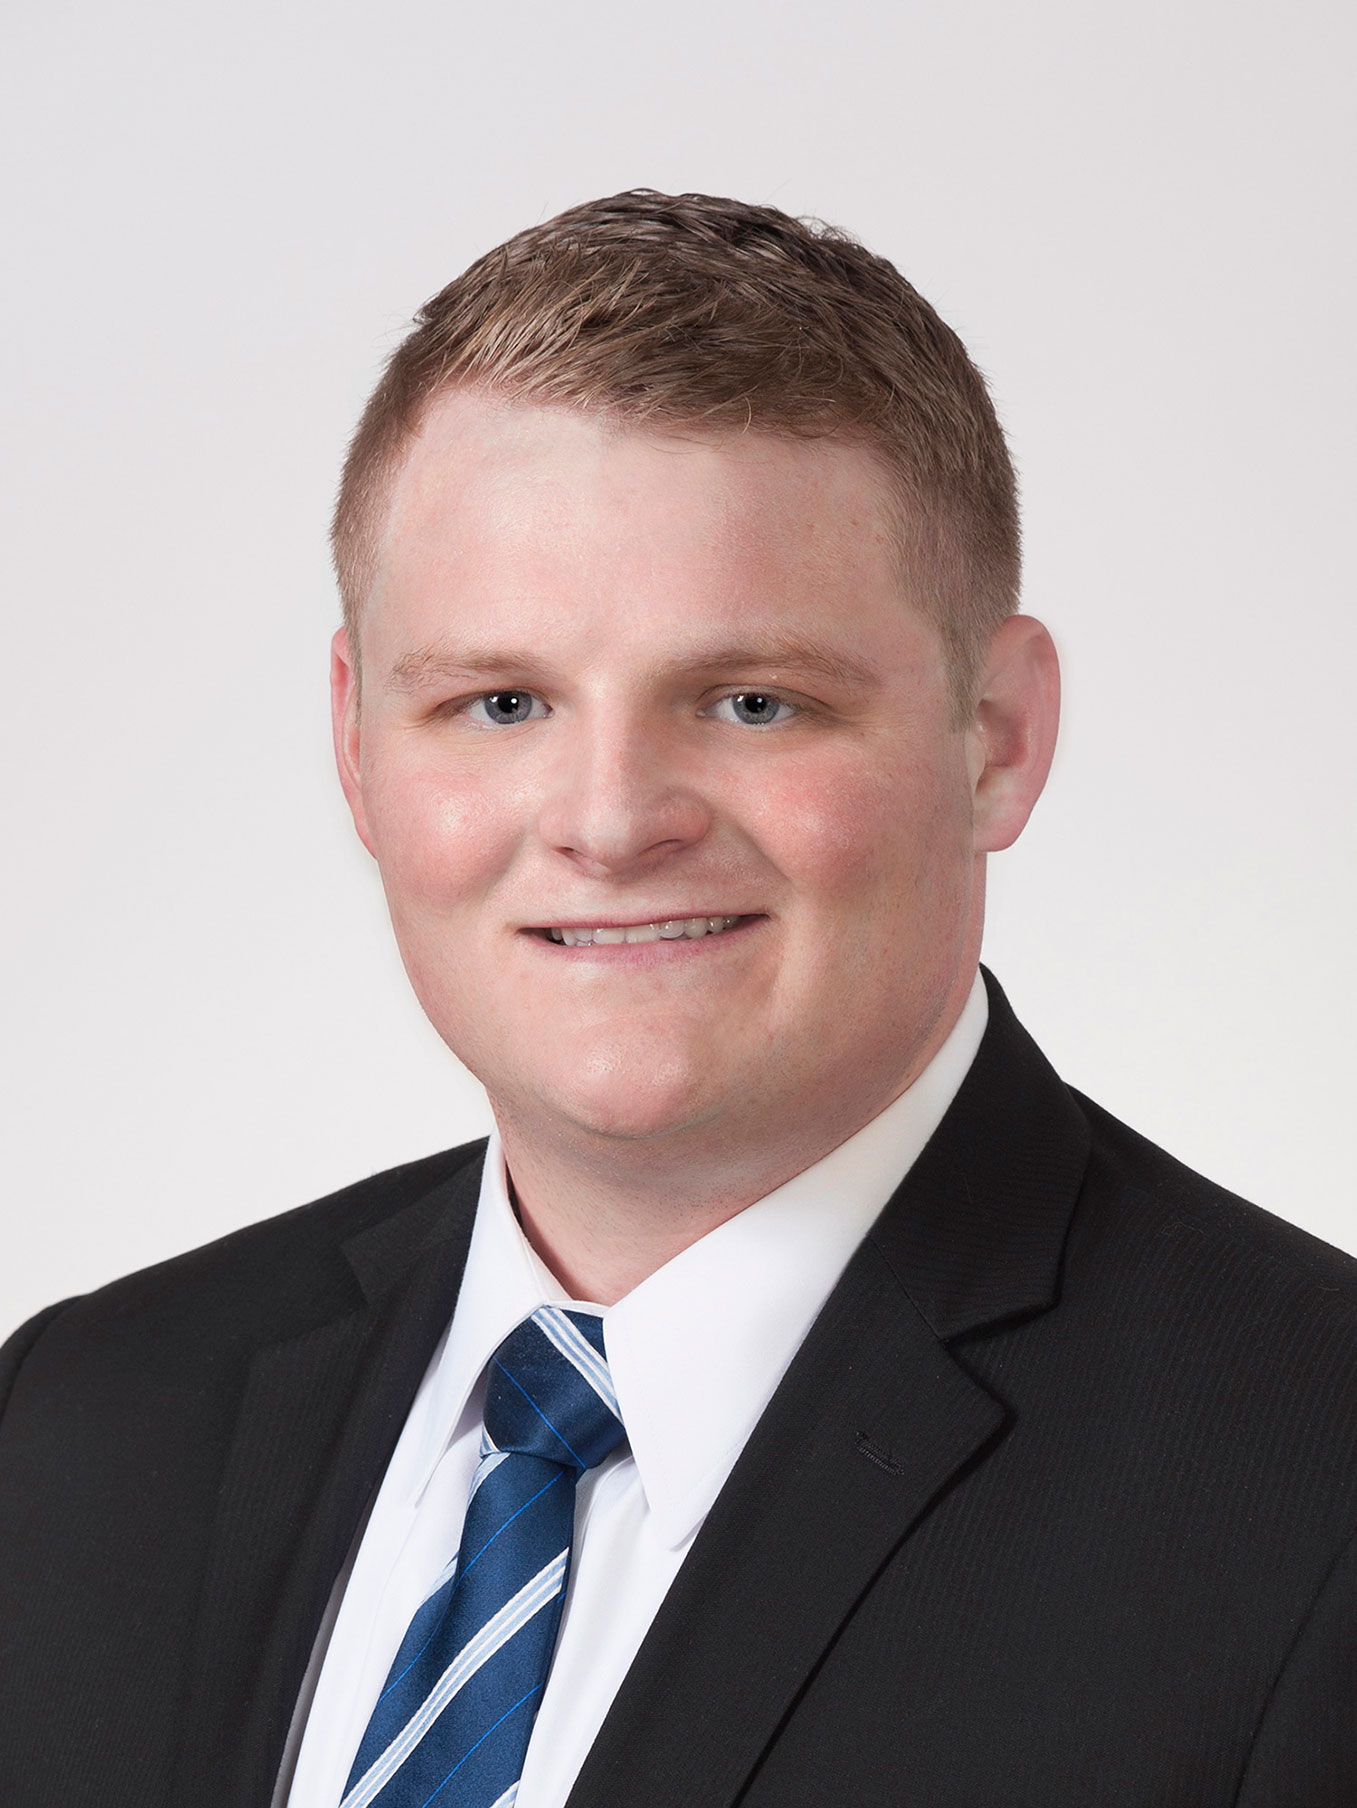 Tyler Hagan, Client Relations for Day Hagan Asset Management in Sarasota, FL.